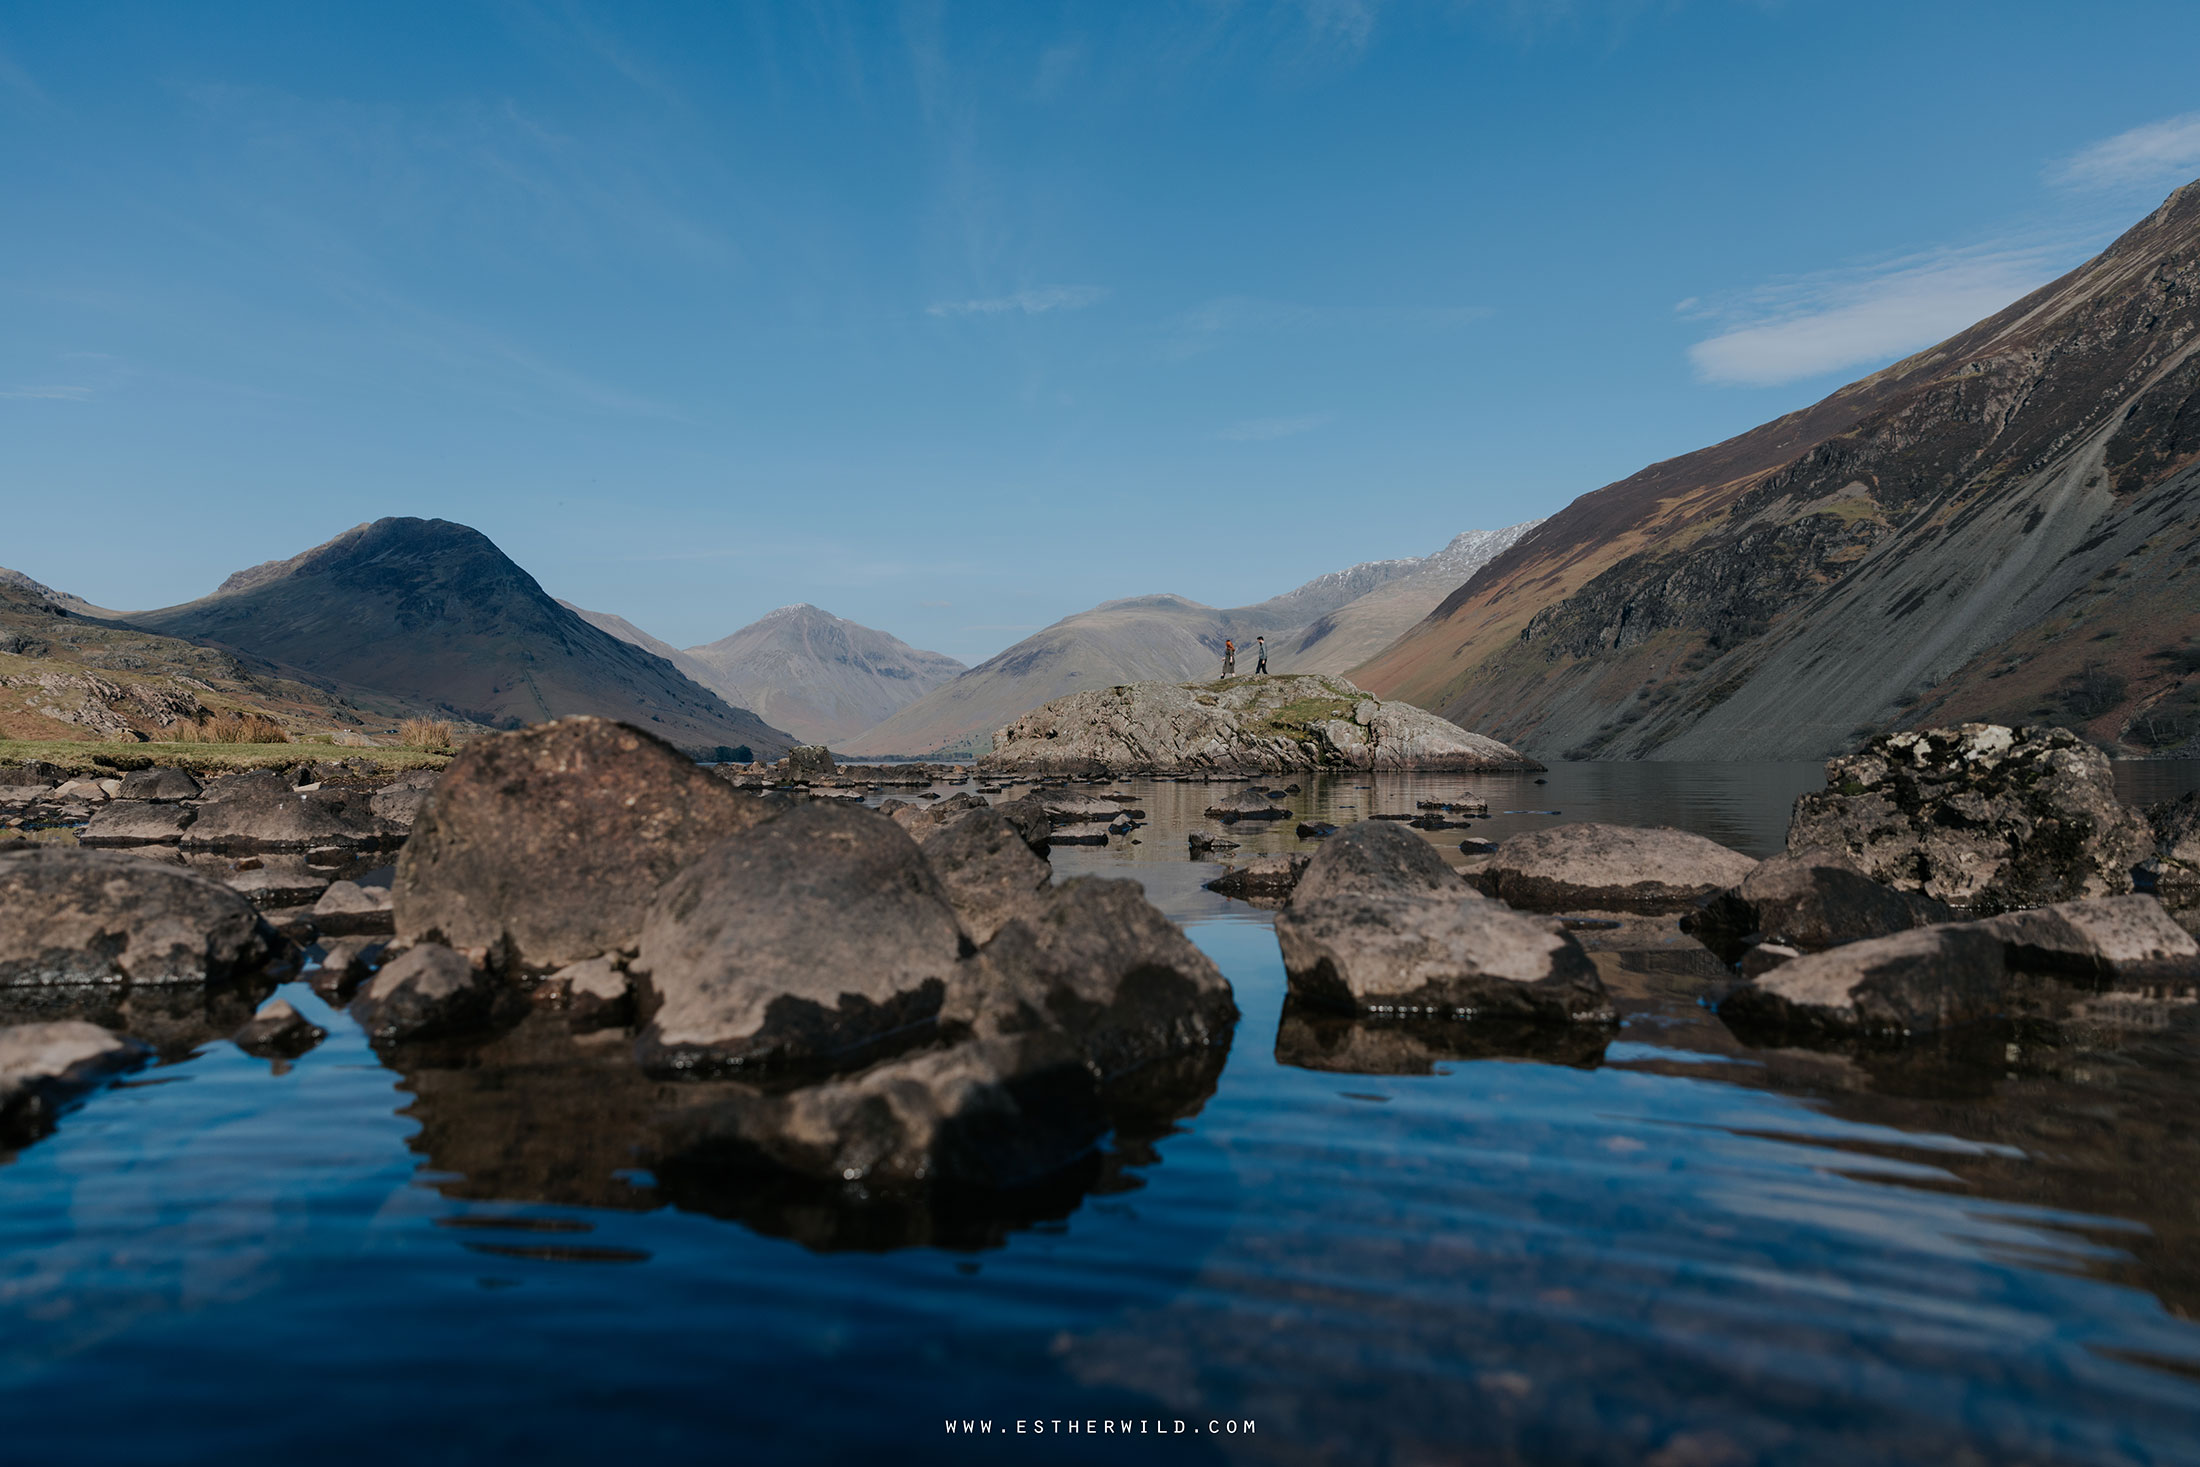 Cumbria_Lake_District_Wasdale_Wedding_Photographer_Destination_Engagement_Anniversary_Esther_Wild_IMG_3439.jpg